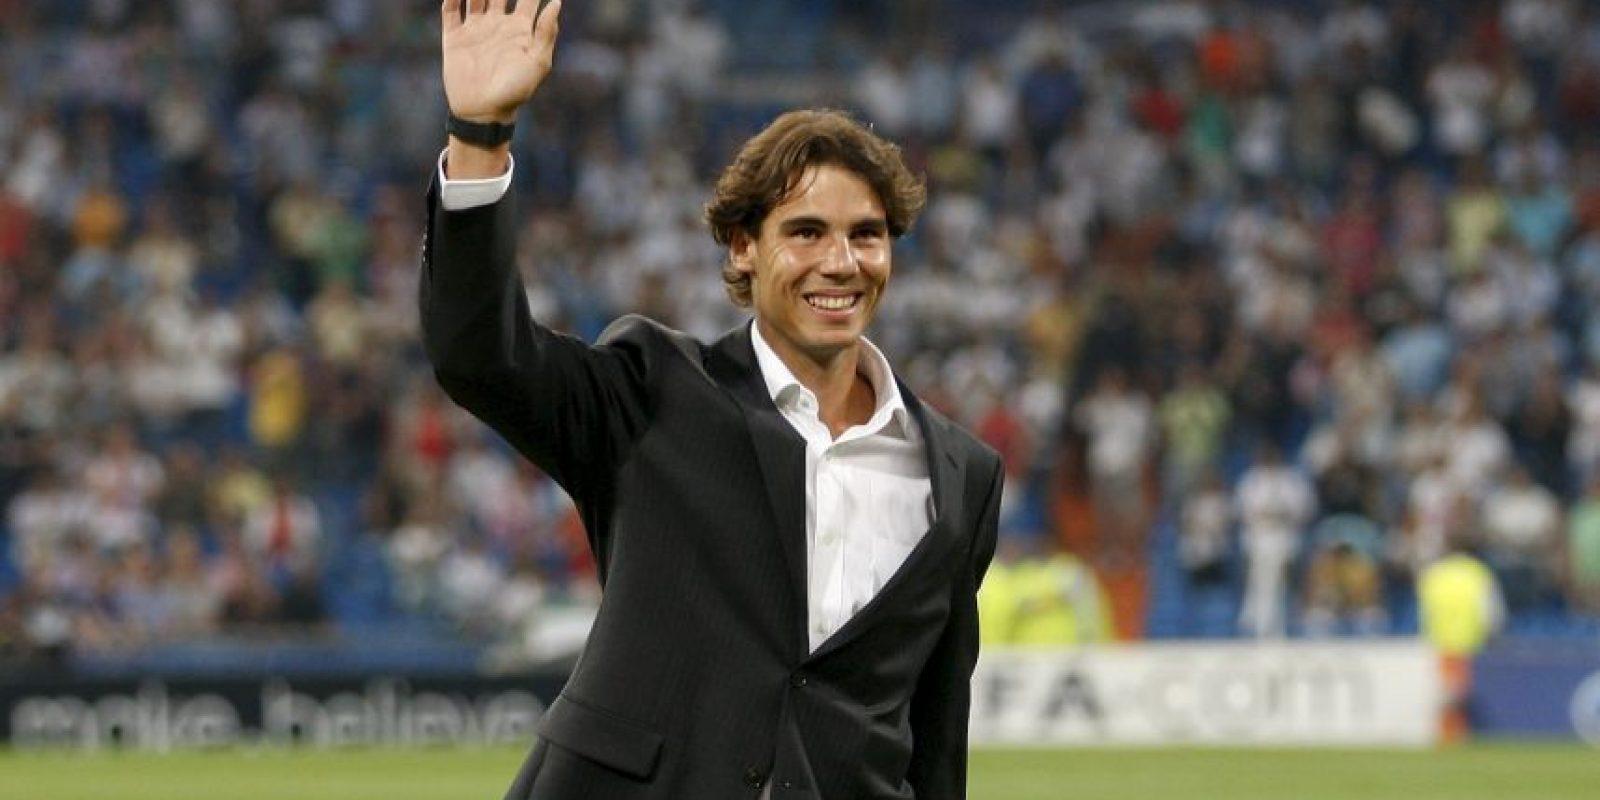 Rafa Nadal (tenista español) – Real Madrid